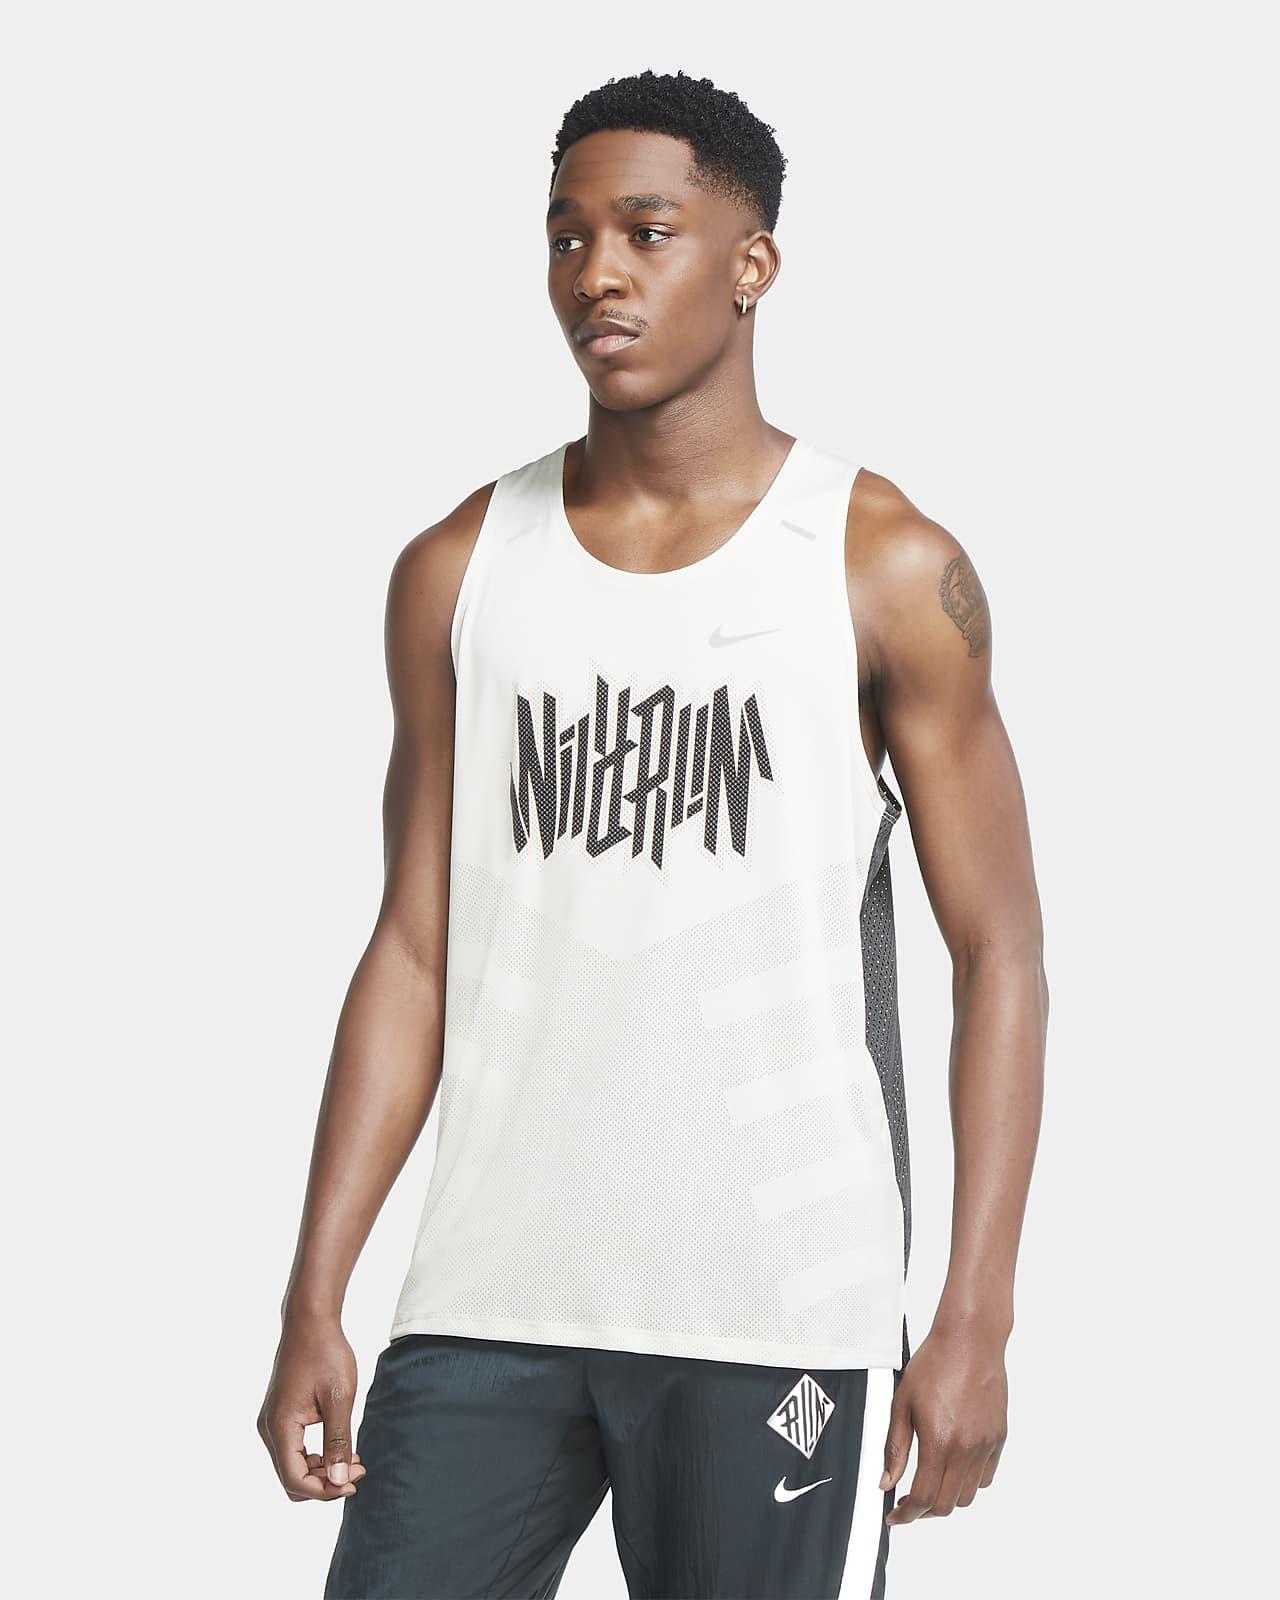 Canotta da running Nike Dri-FIT Rise 365 Wild Run - Uomo